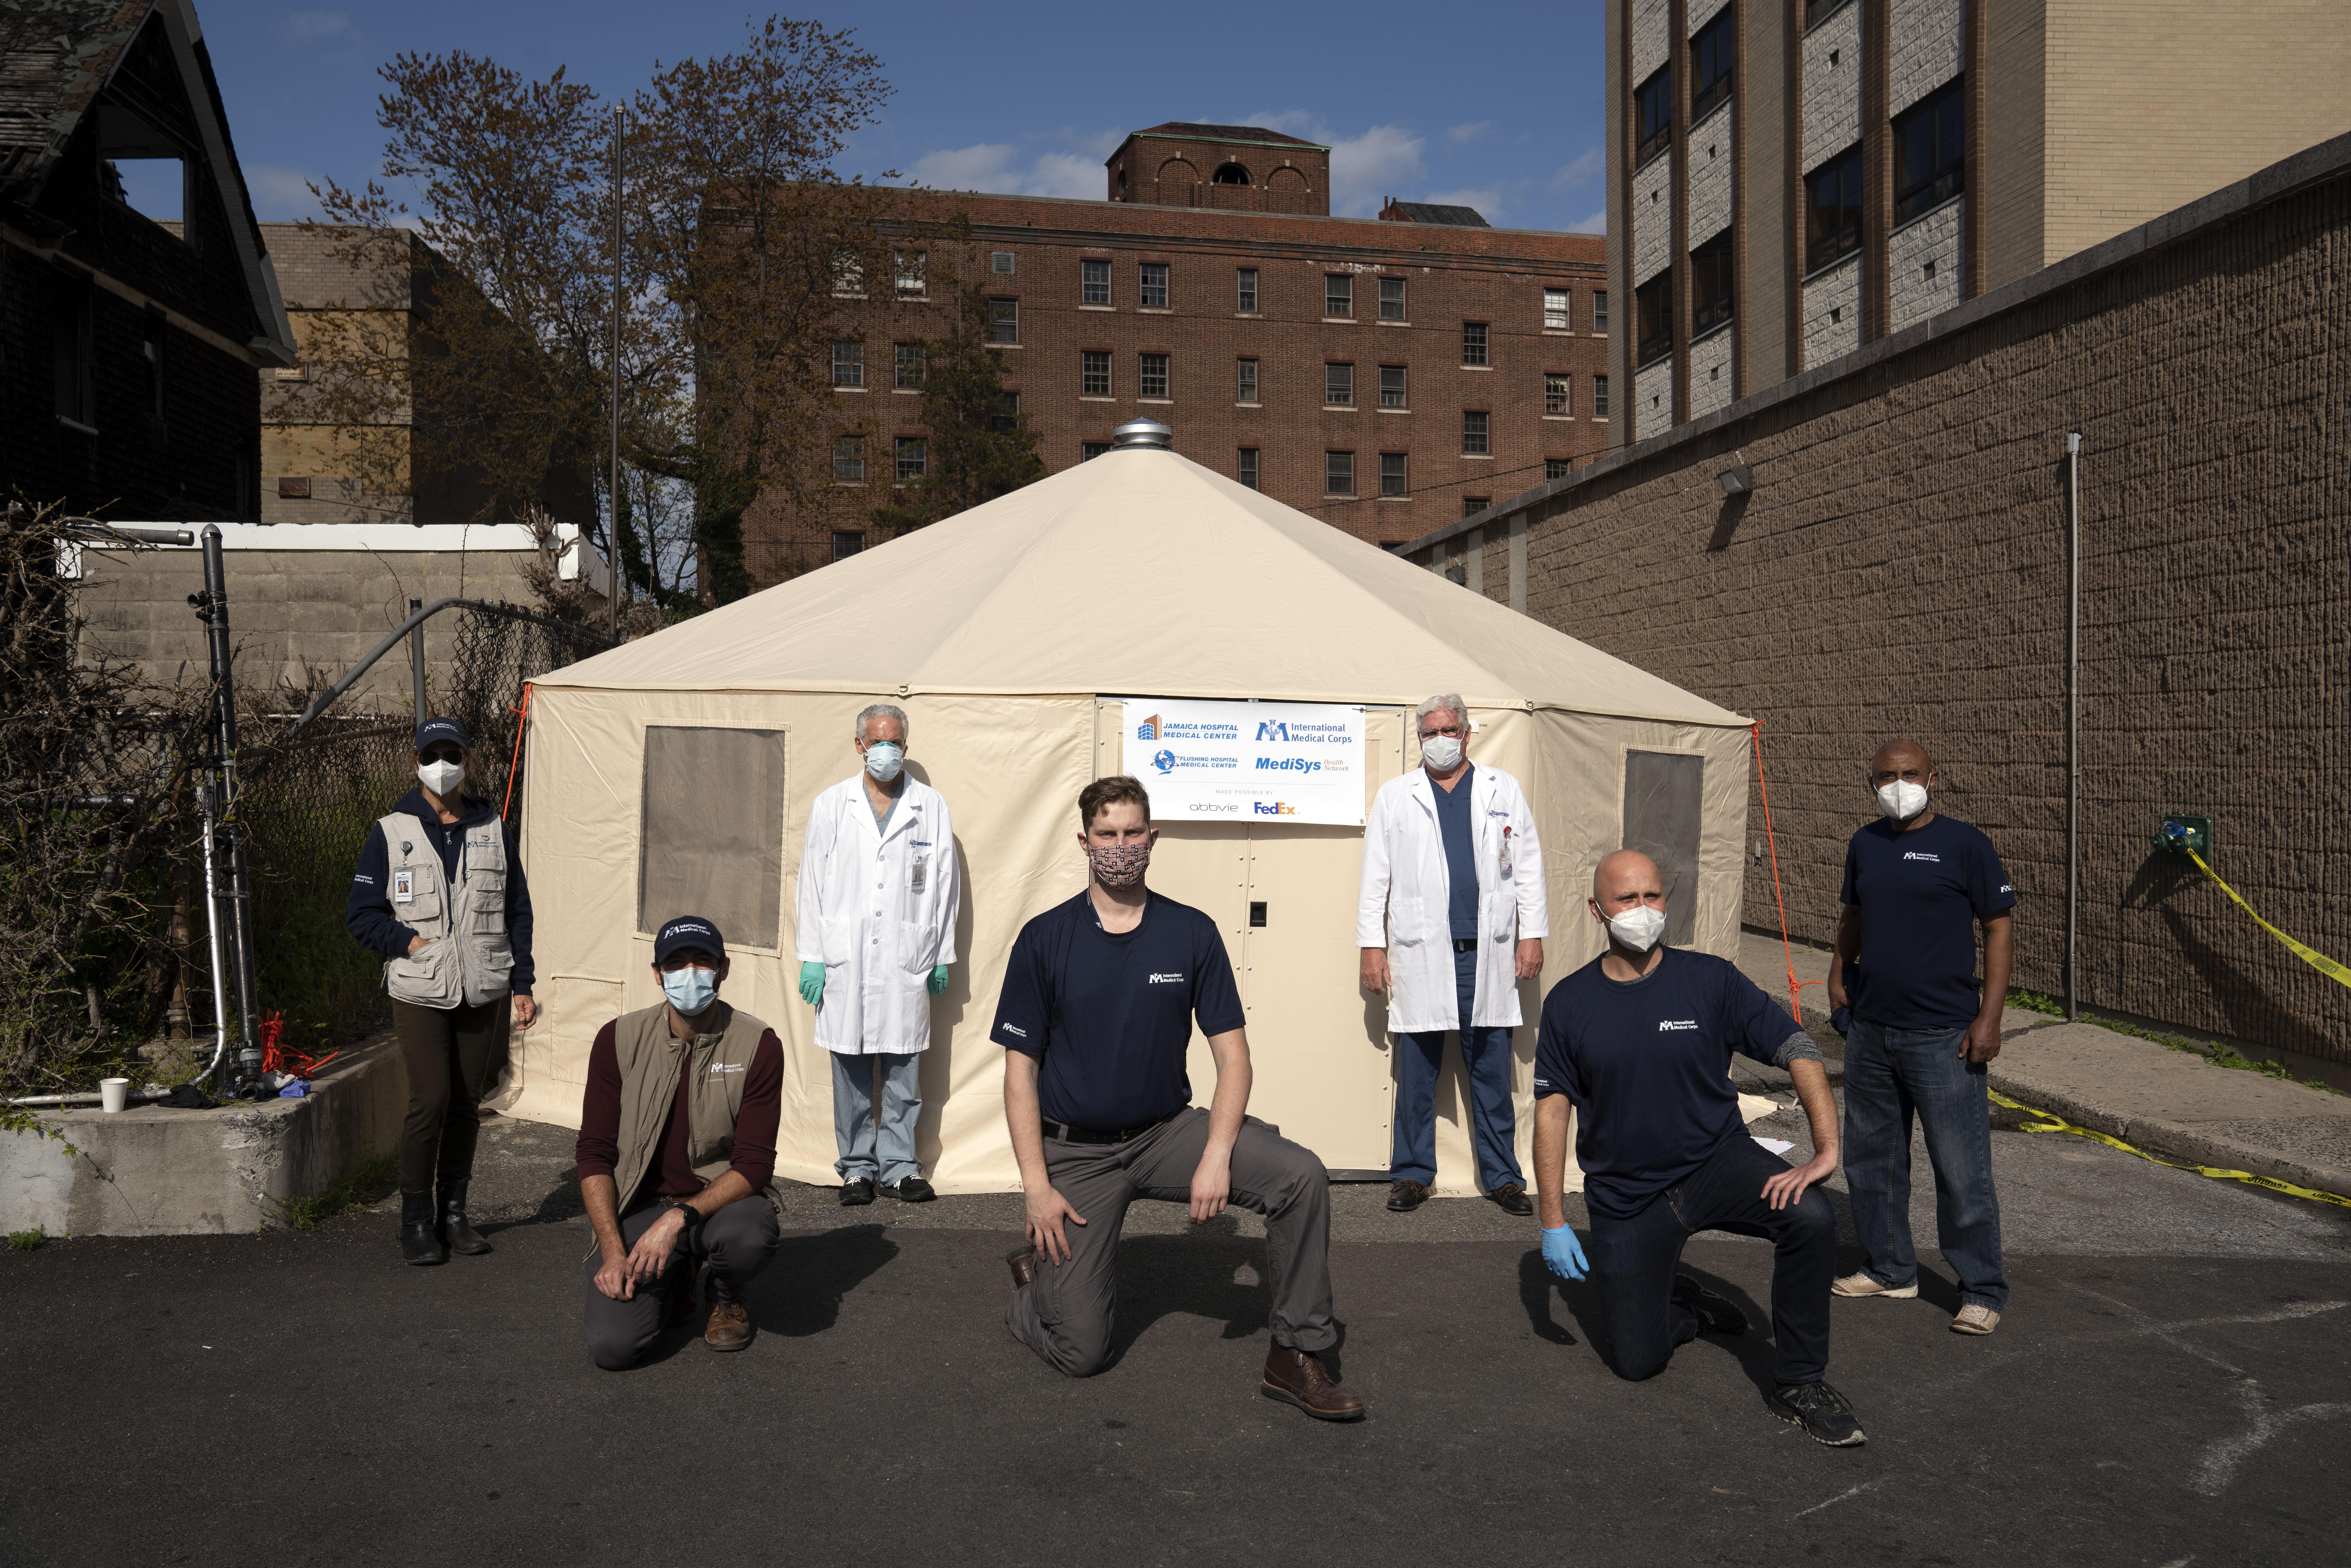 NYC - Flushing Medical Center - Emergency Medical Field Units set up Photo credit: Ben Lowy